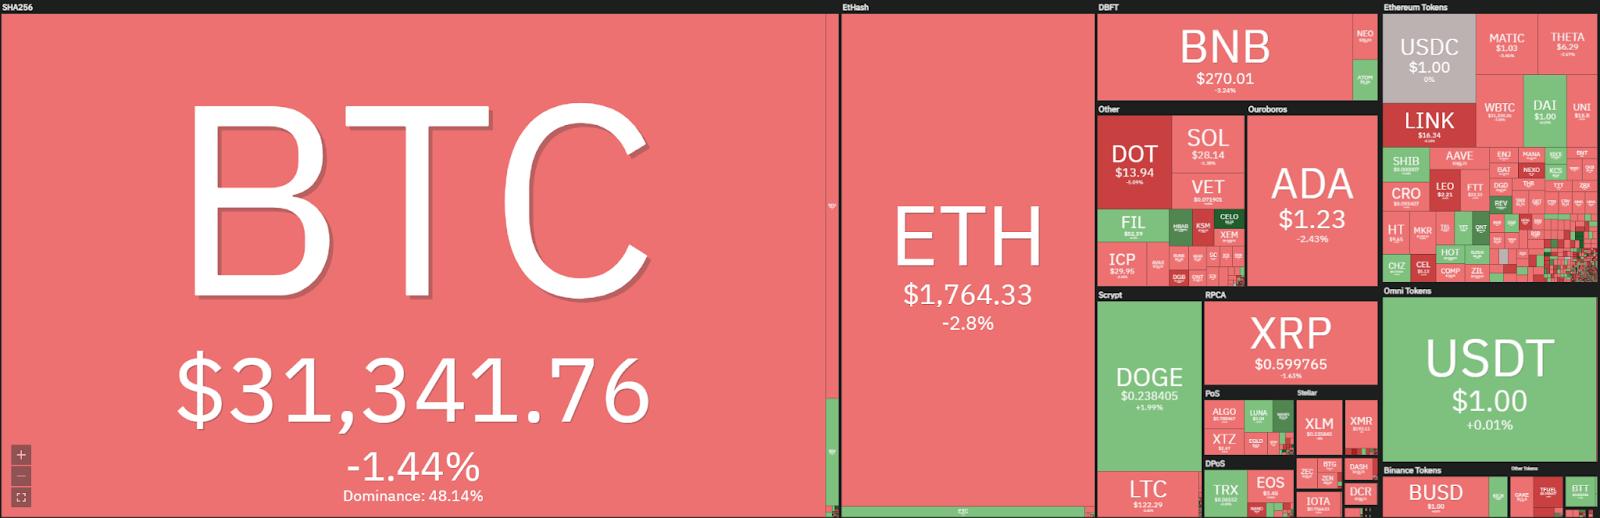 Litecoin price analysis: Litecoin slowly declines to $120, prepares to break lower? 1